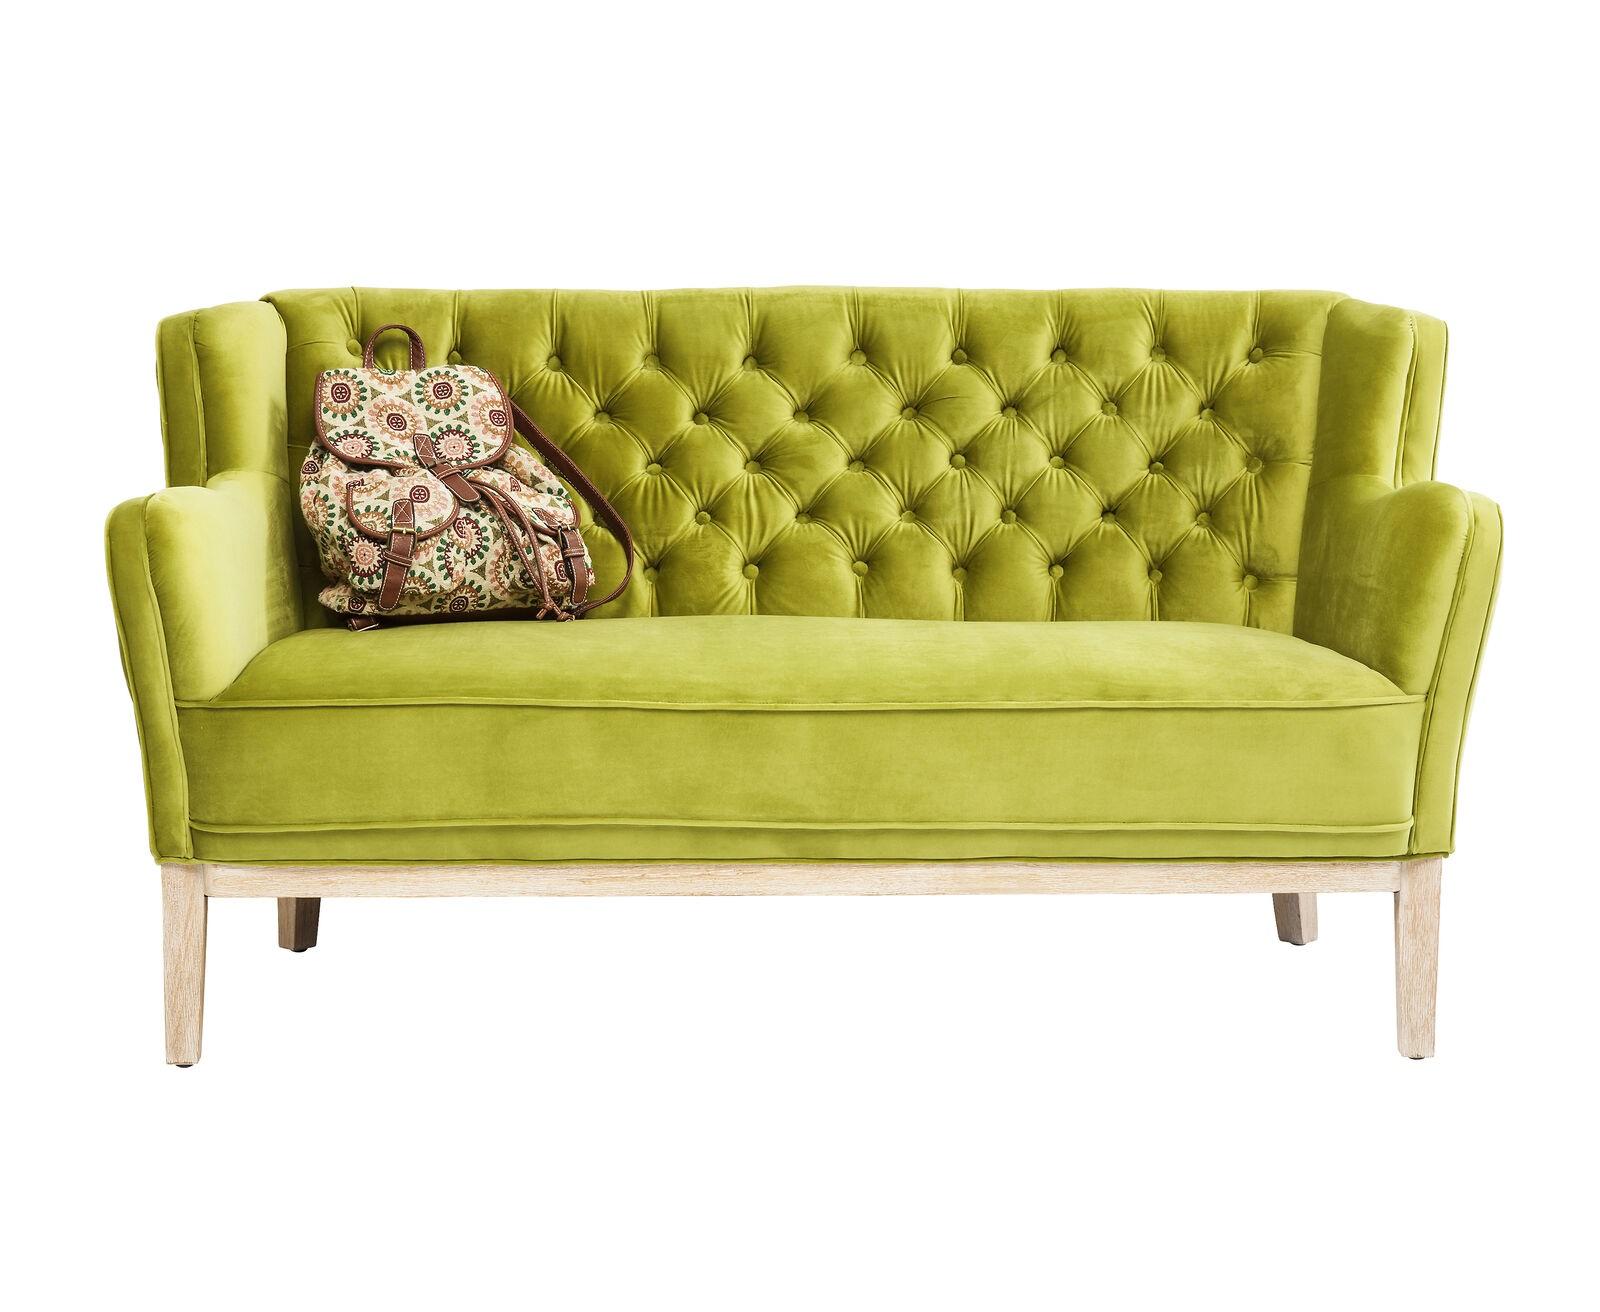 Kare диван coffee shop зеленый 143338/2